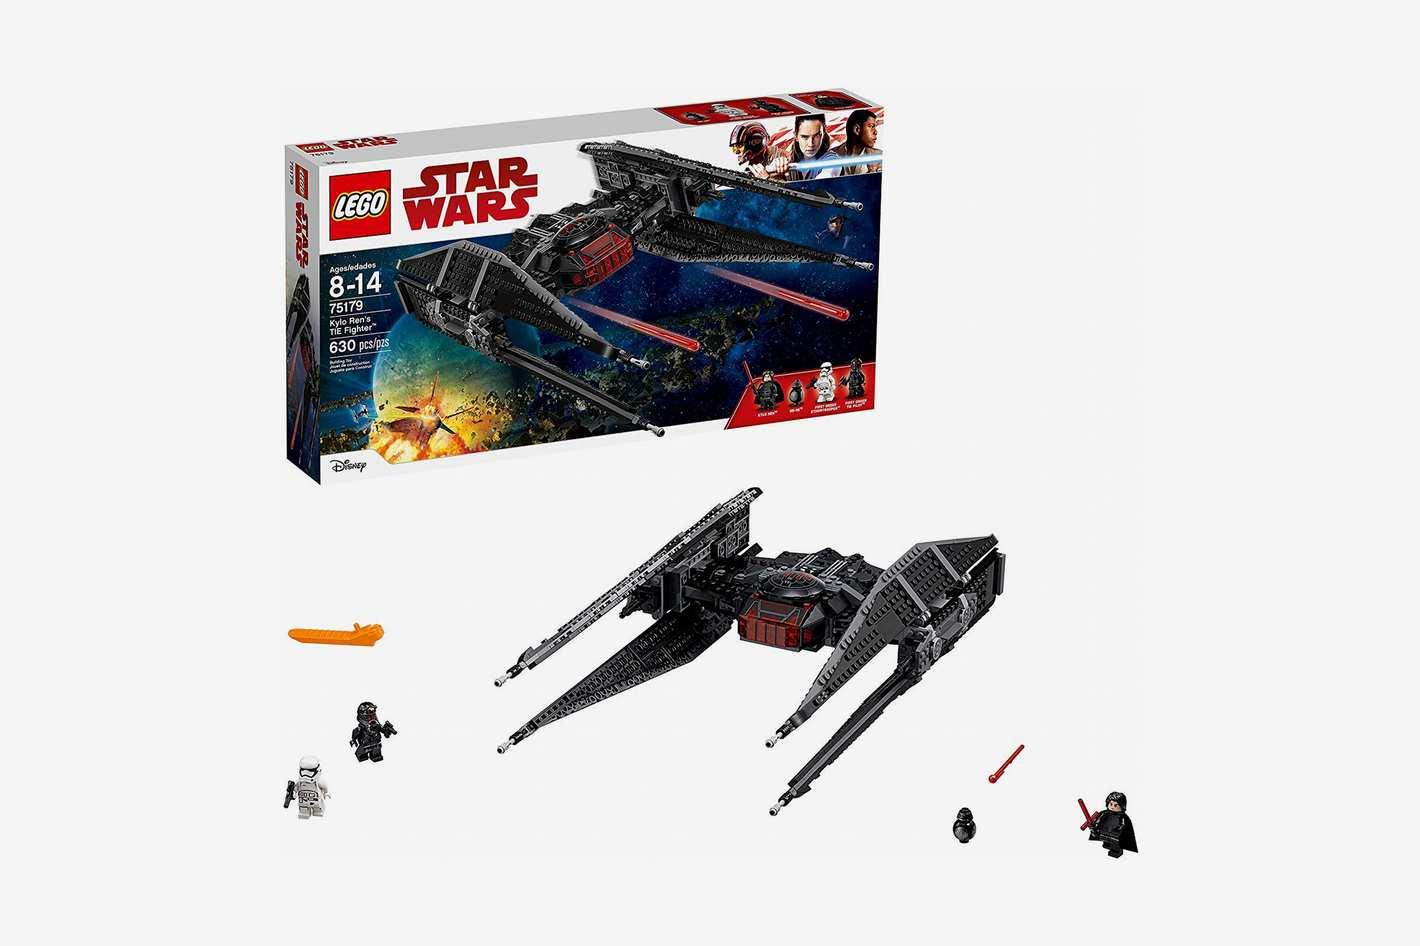 LEGO Star Wars Episode VIII Kylo Ren's Tie Fighter 75179 Building Kit